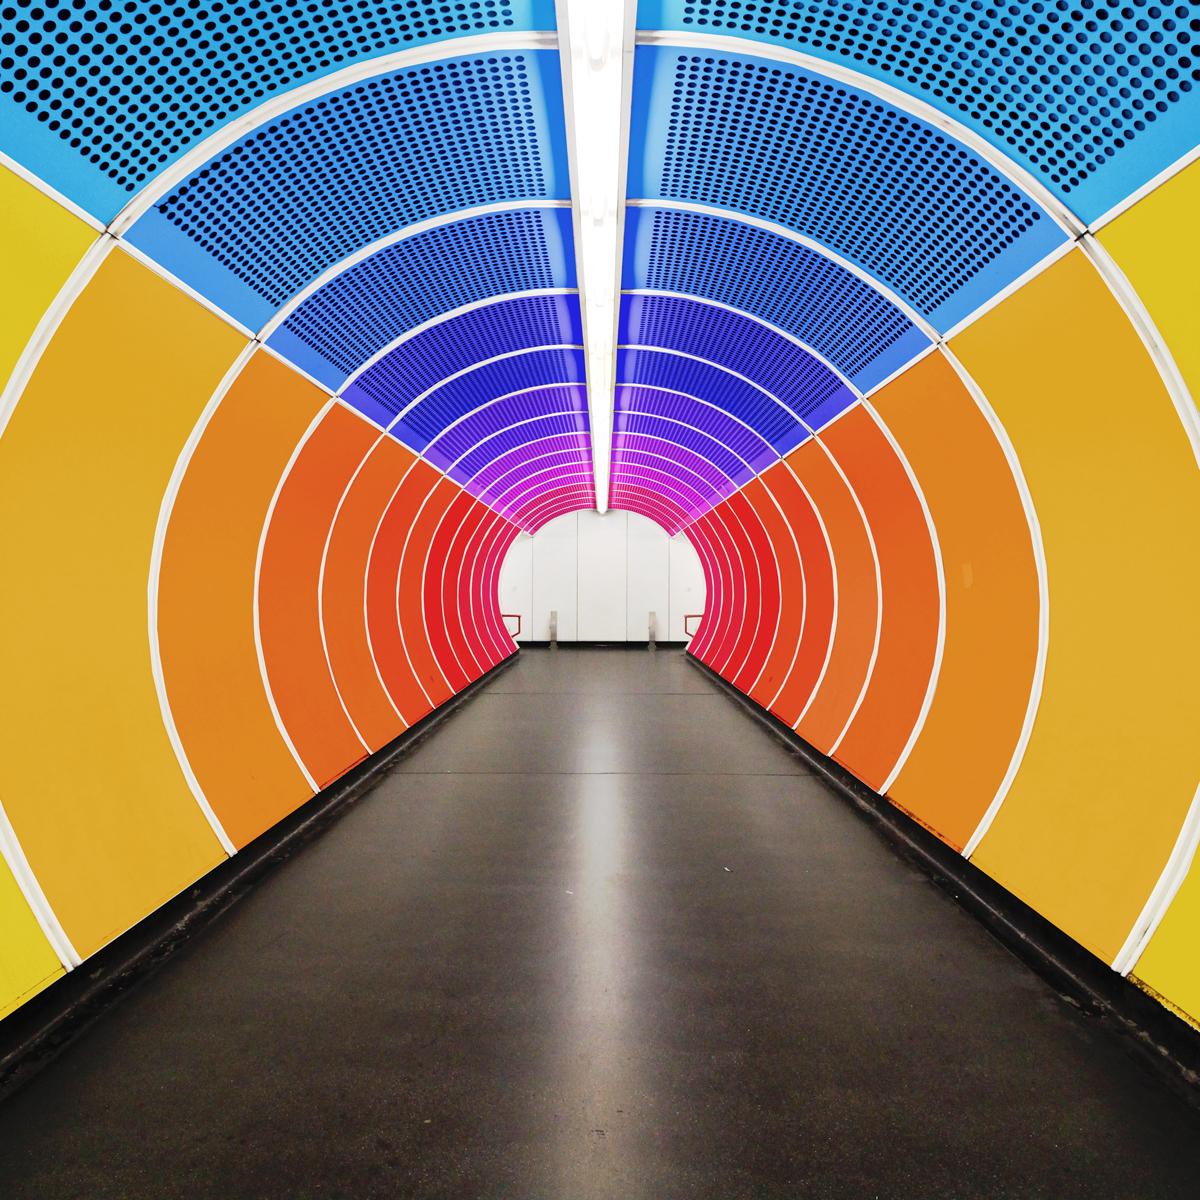 paul-eis-farbe-architektur5